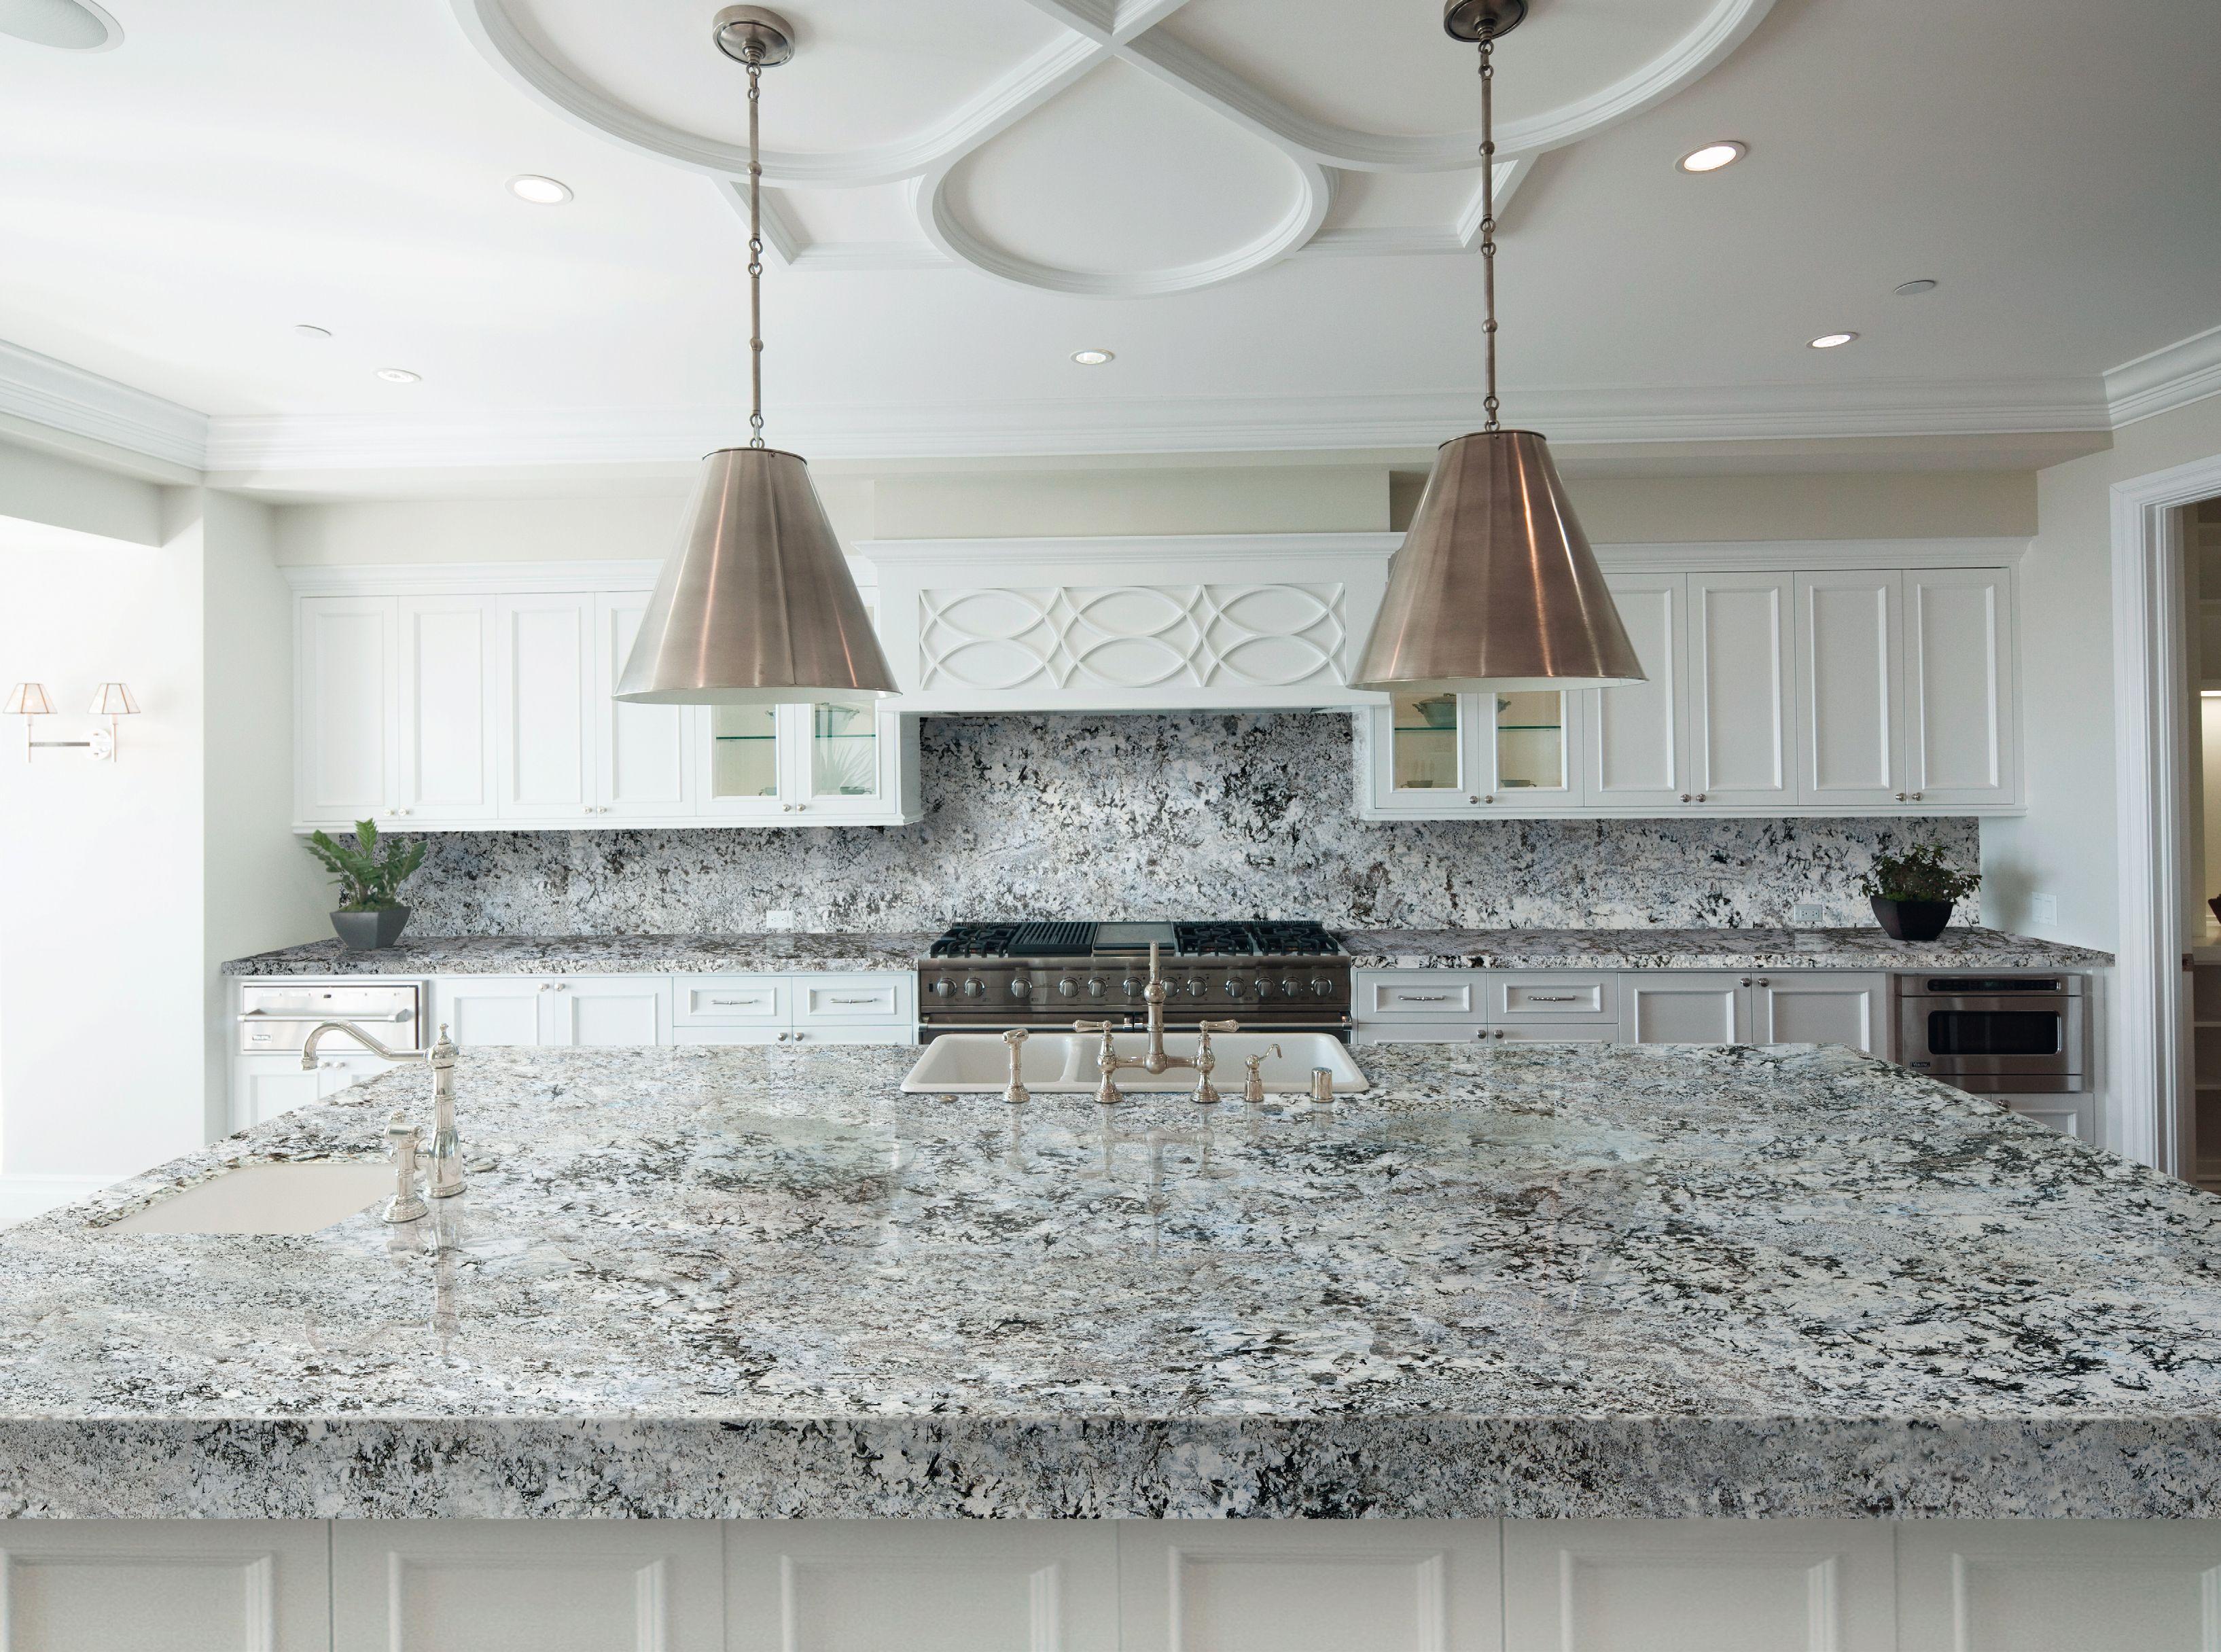 White apron gainesville fl - New Azul Aran Granite Http Www Marmol Com Product